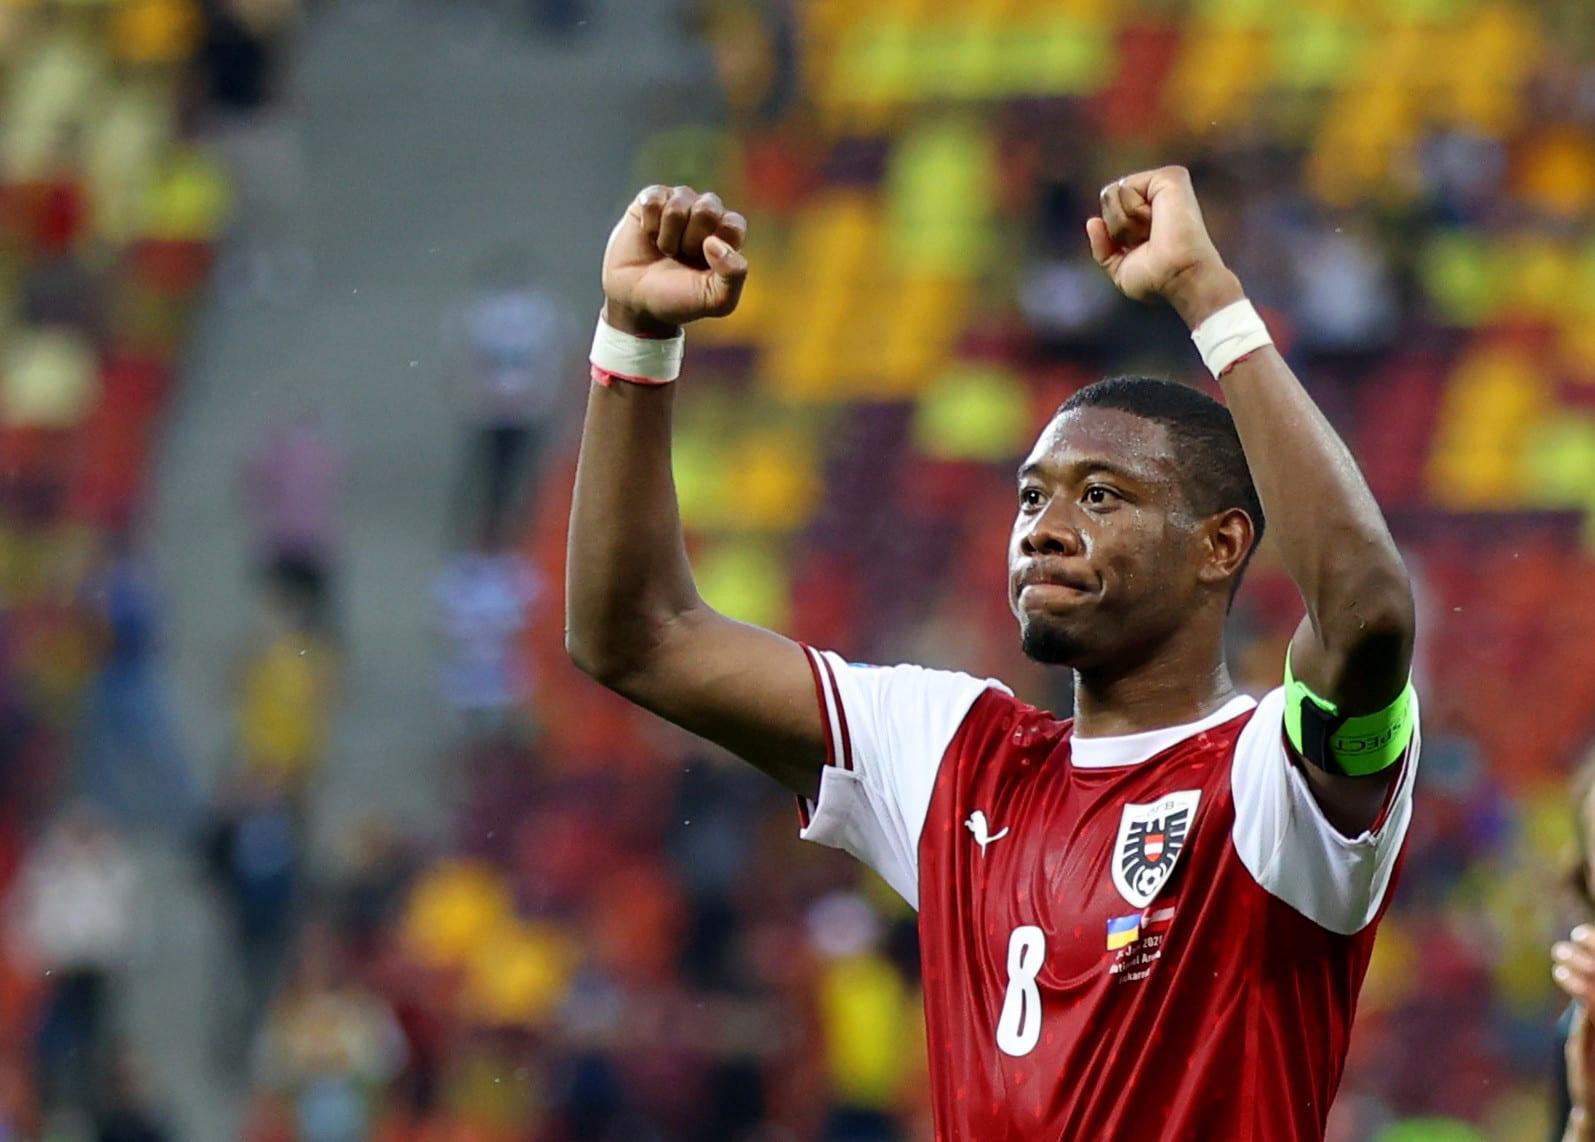 David Alaba Austria national team player